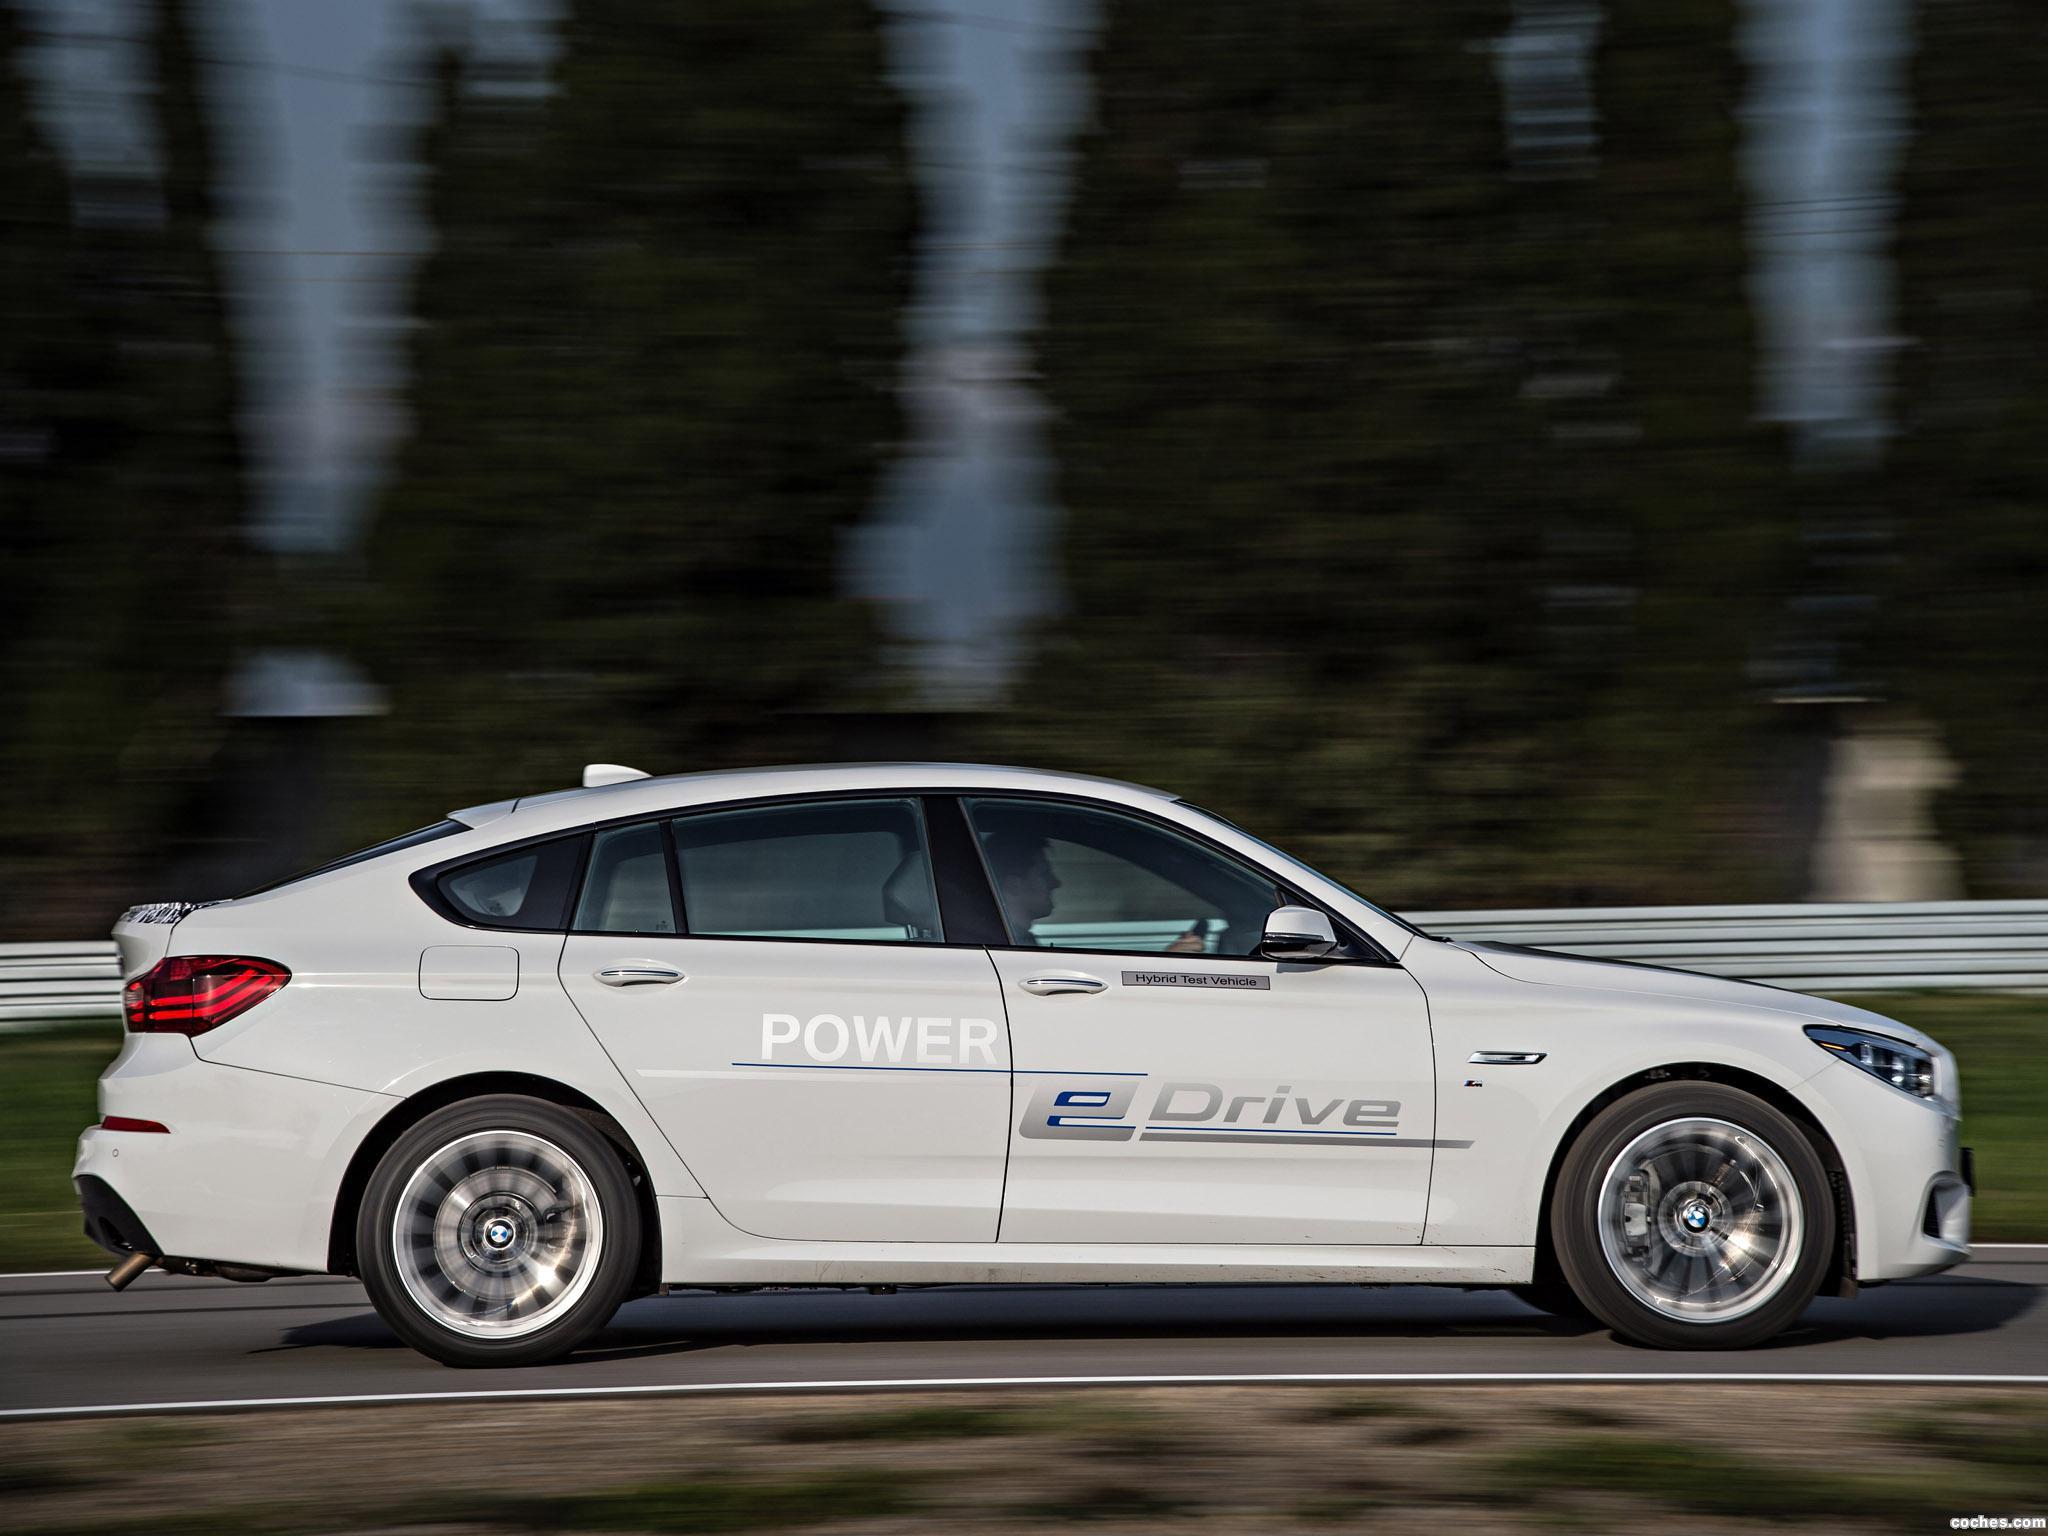 Foto 2 de BMW Serie 5 Gran Turismo Edrive Prototype 2014